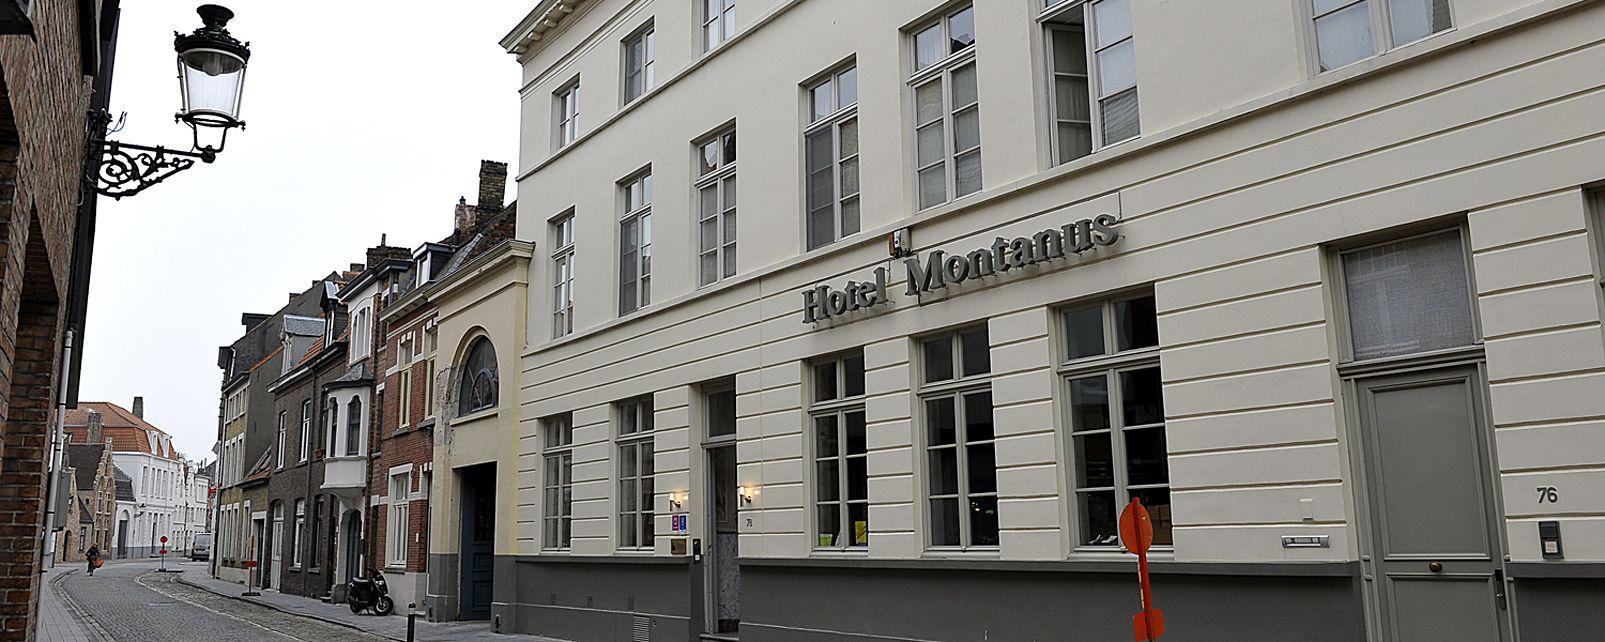 Hôtel Montanus